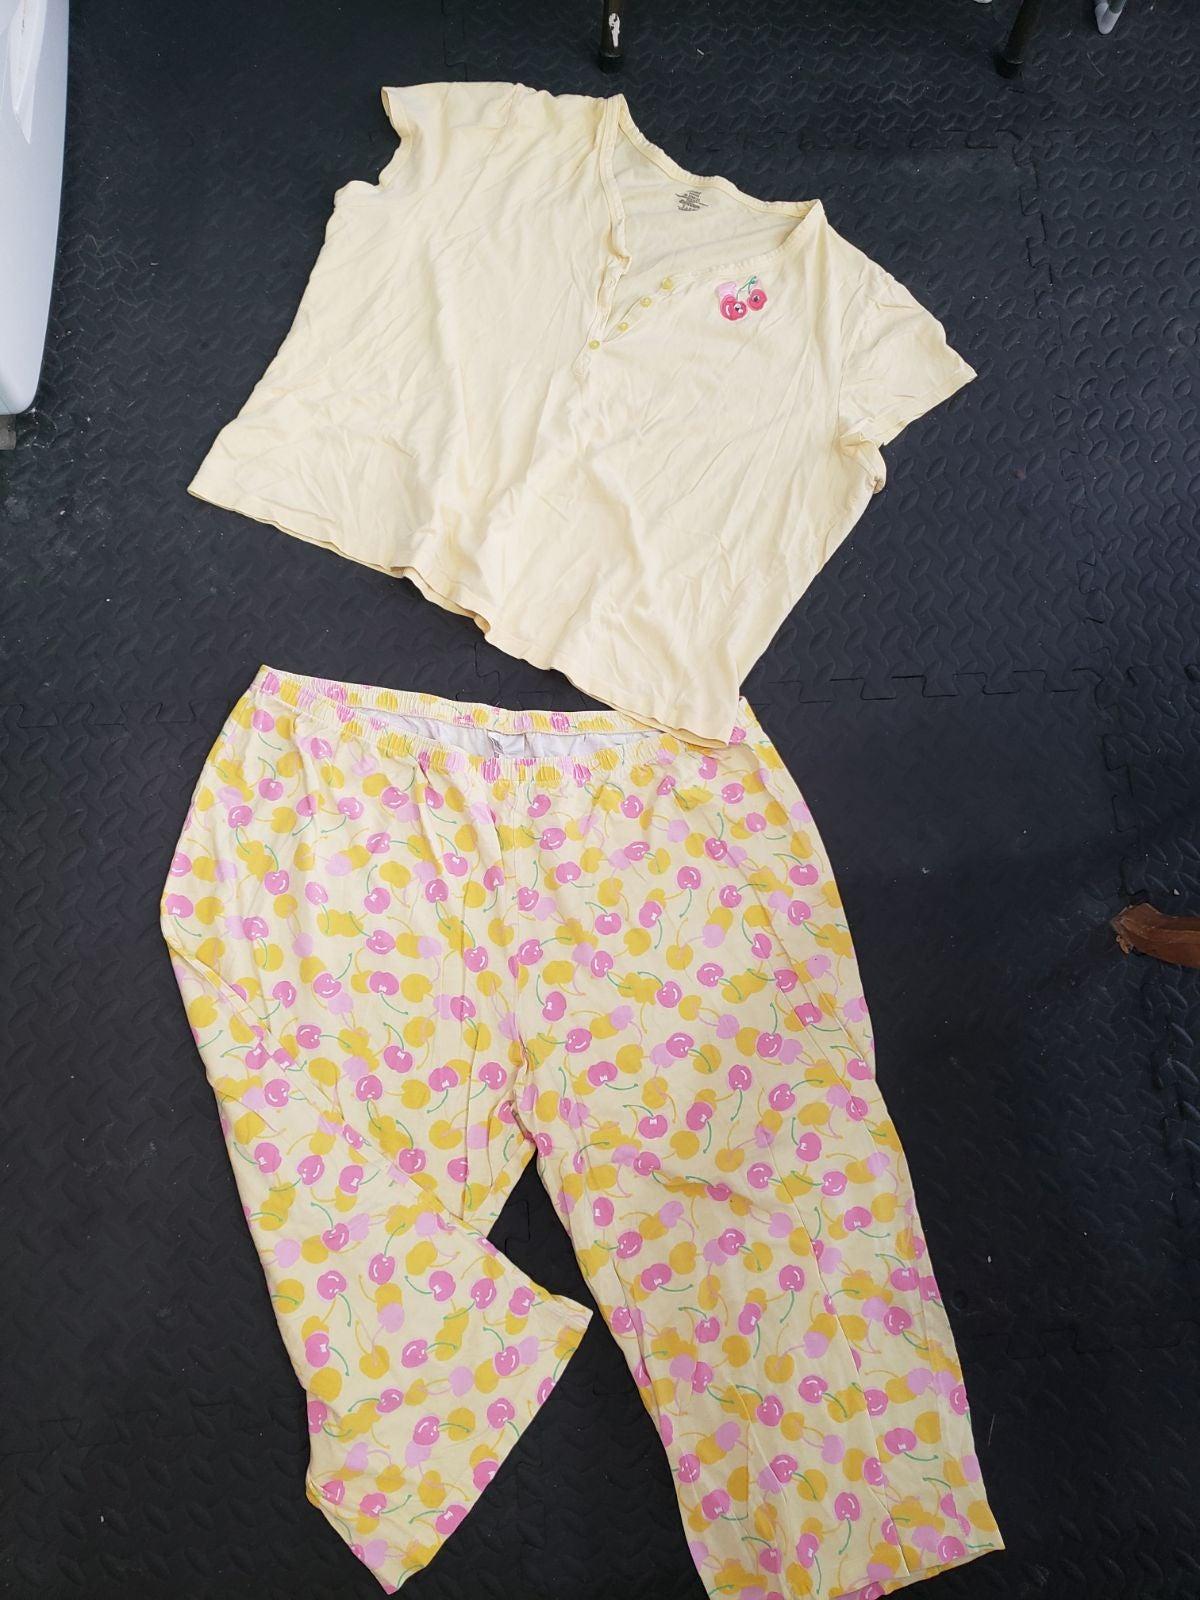 Adonna woman 2xl cherry print pajama set